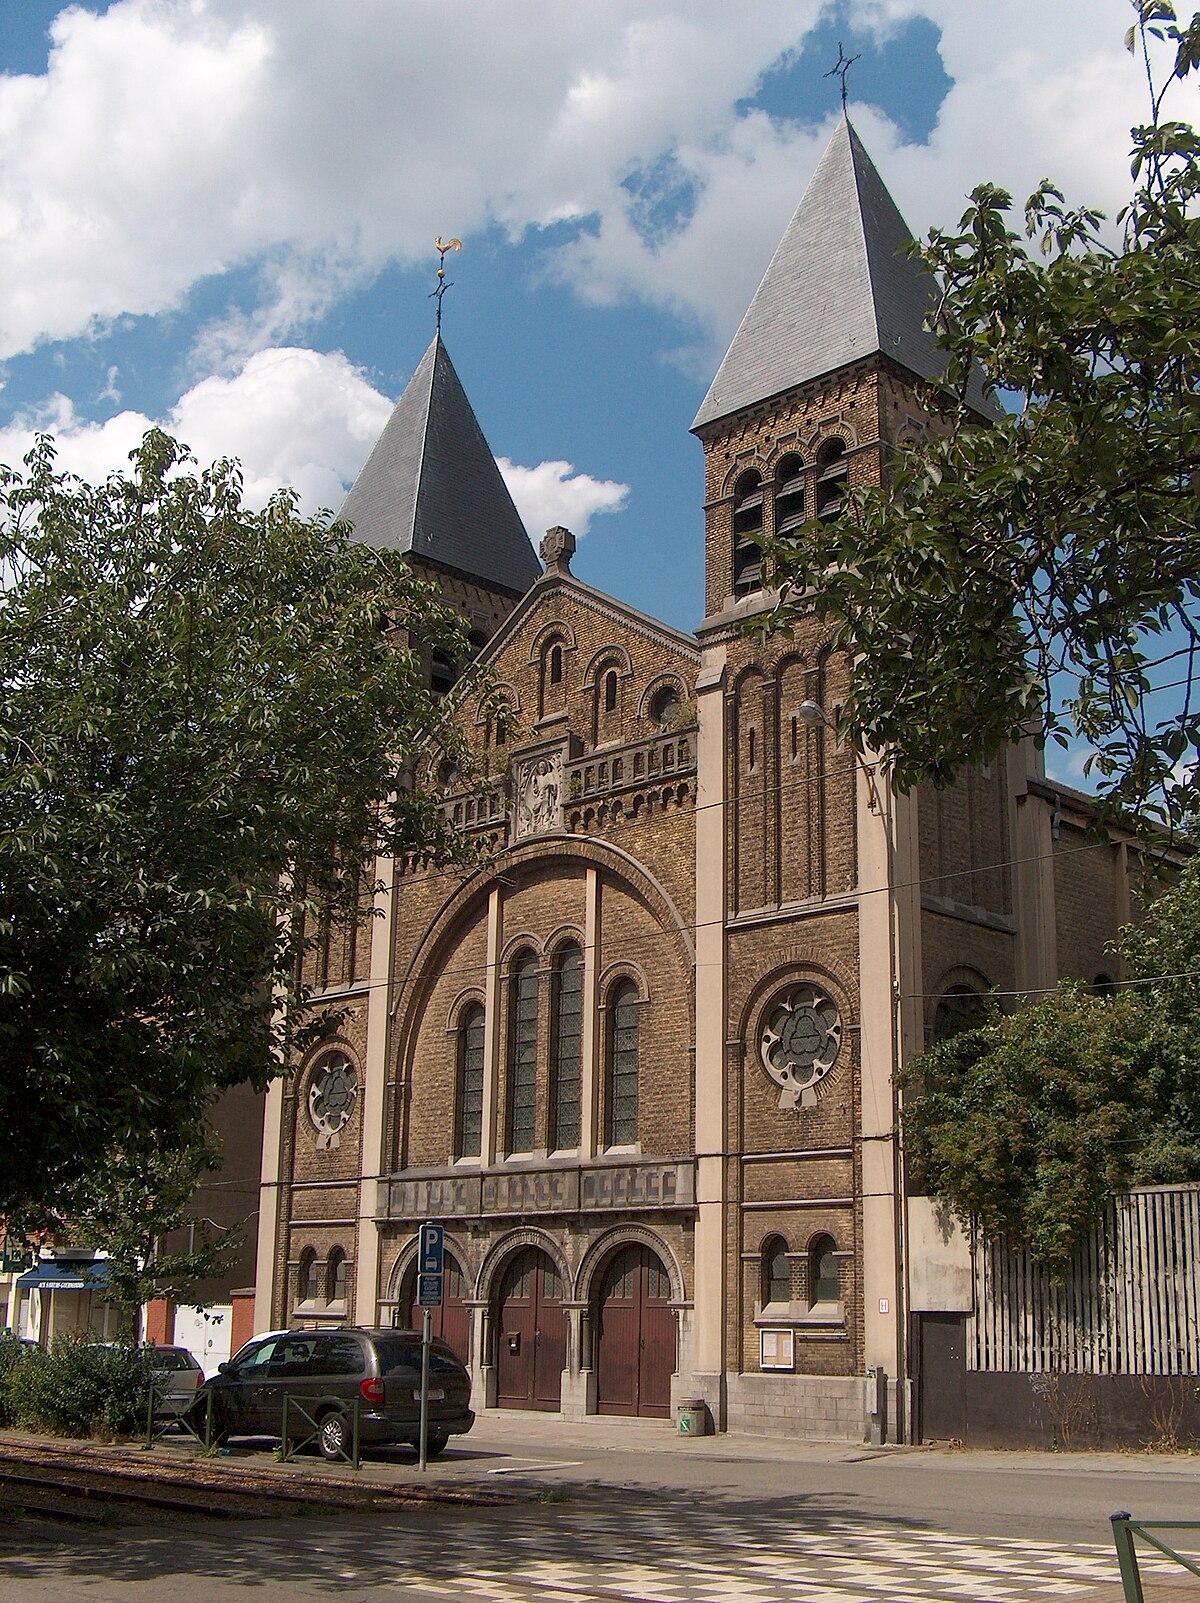 Glise sainte th r se d 39 avila schaerbeek wikip dia - Eglise sainte therese guilherand granges ...